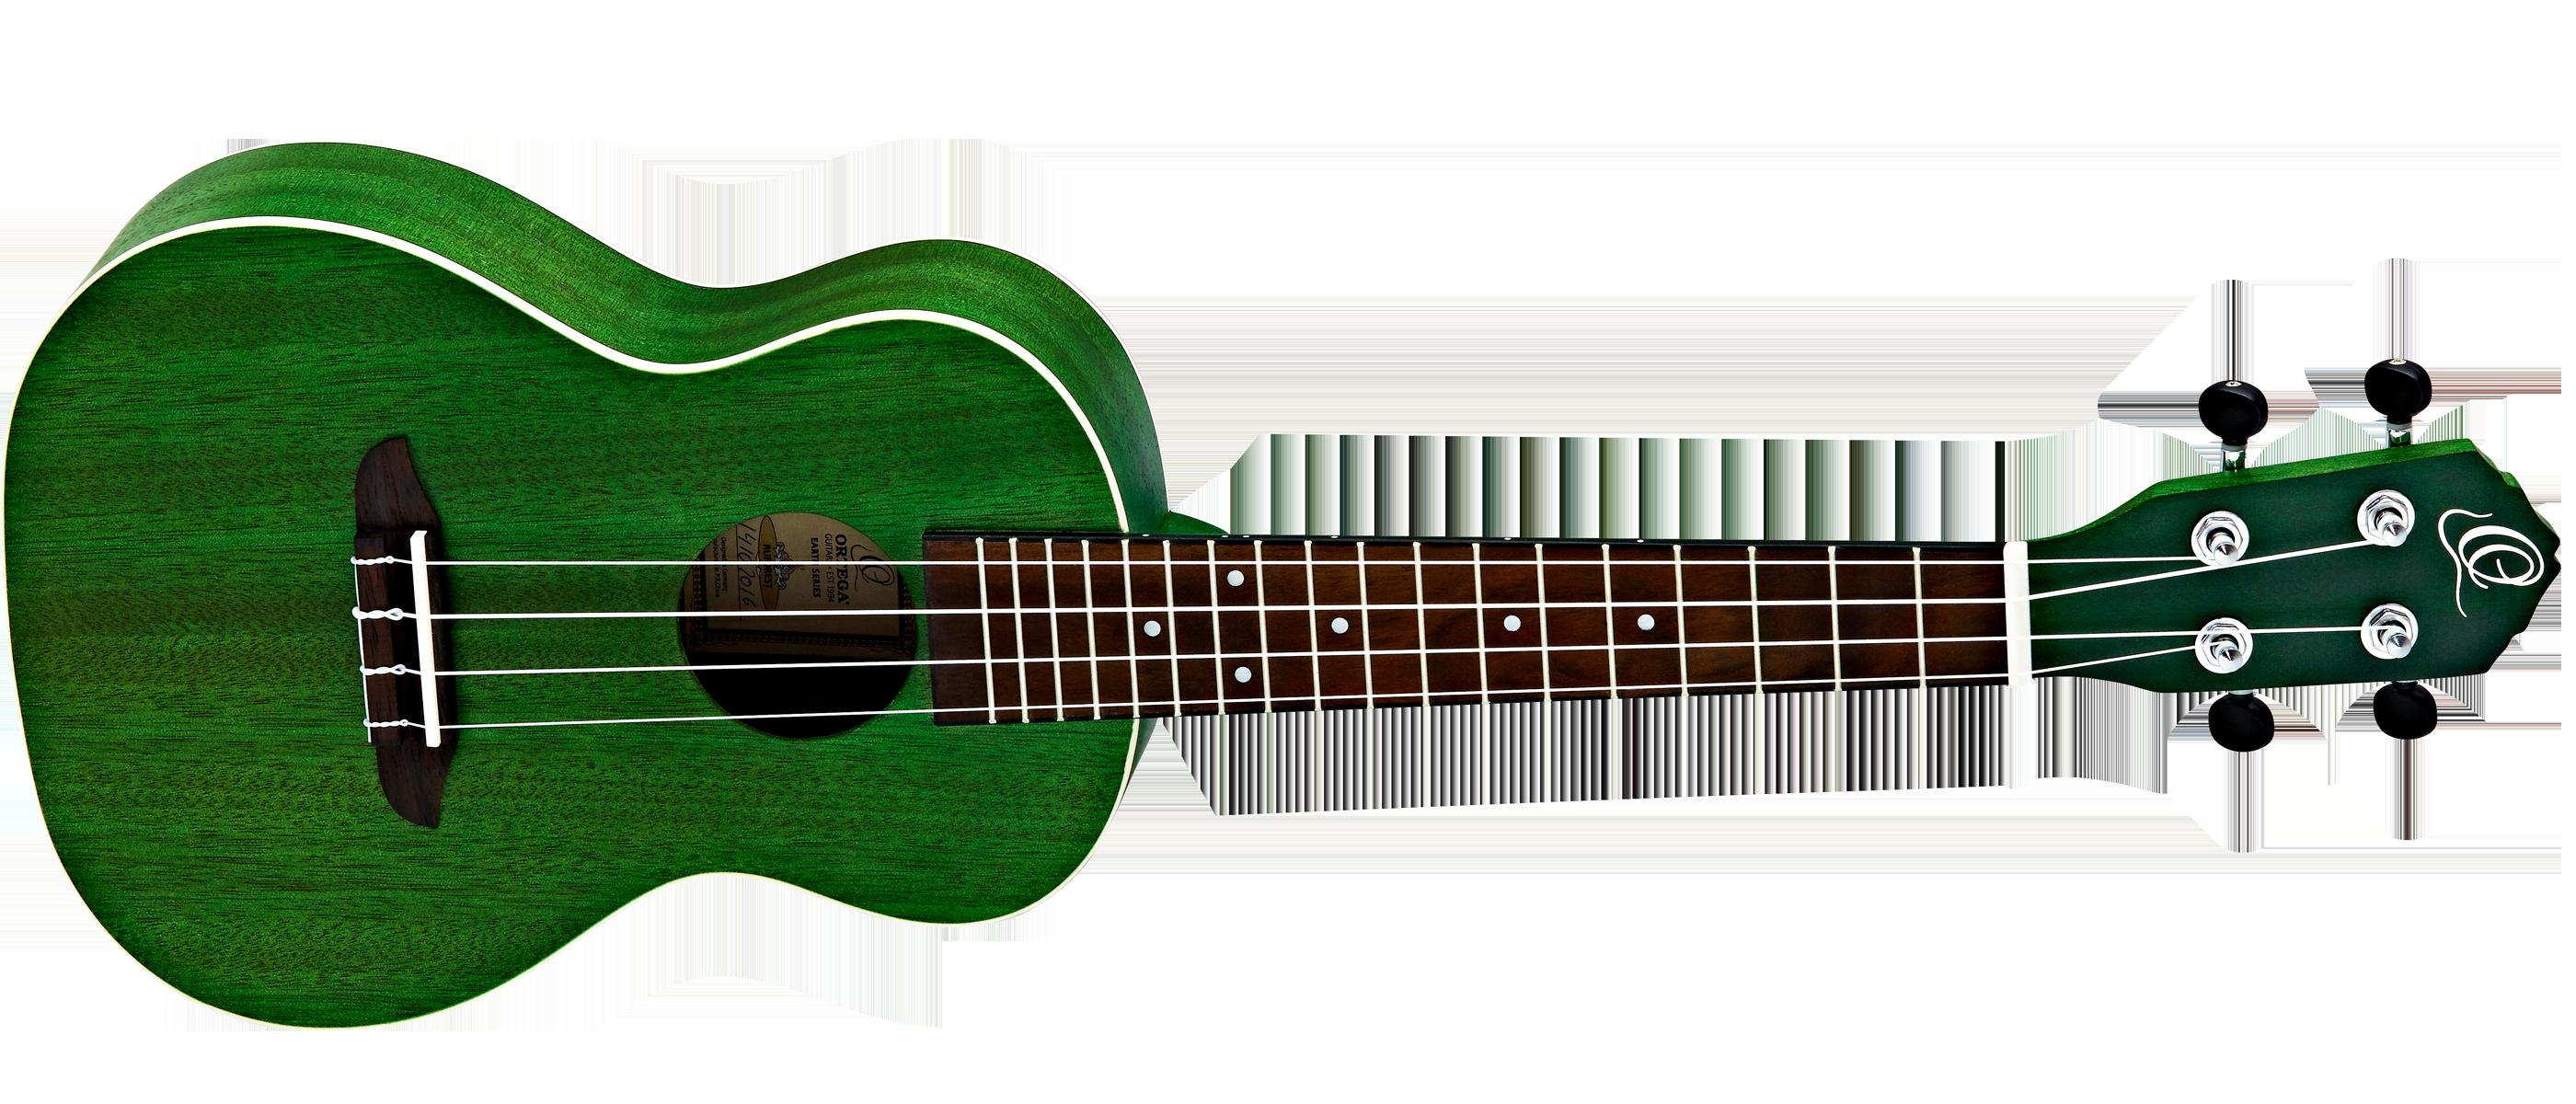 Ortega your ruforest . Clipart guitar ukelele